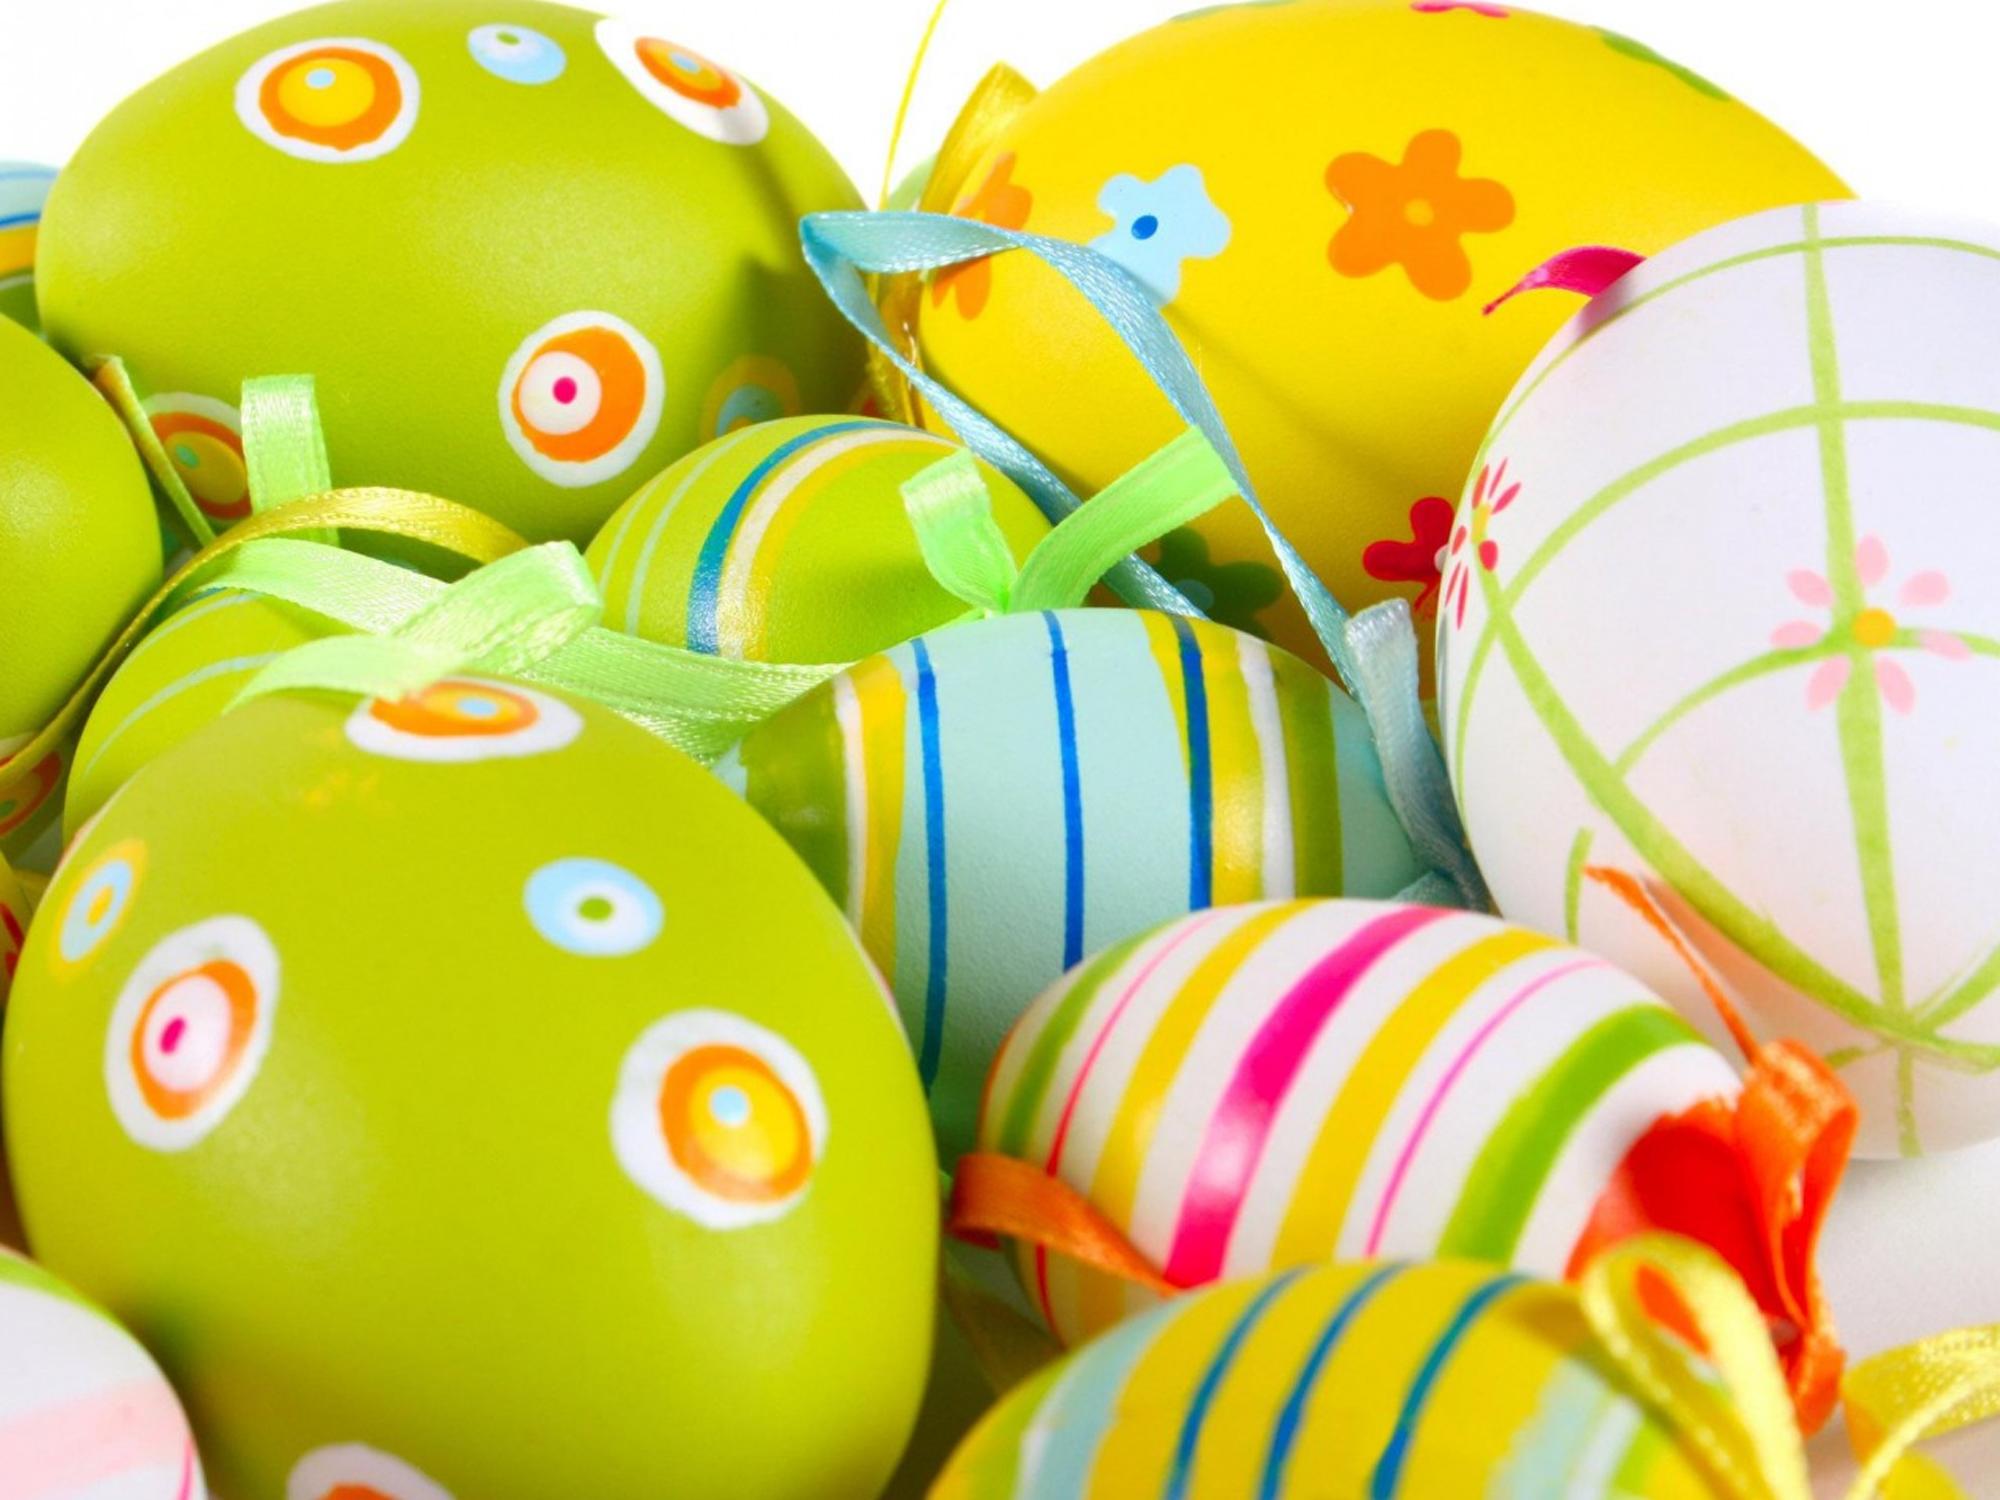 11 Beautiful and Easter Desktop Wallpapers 2000x1500